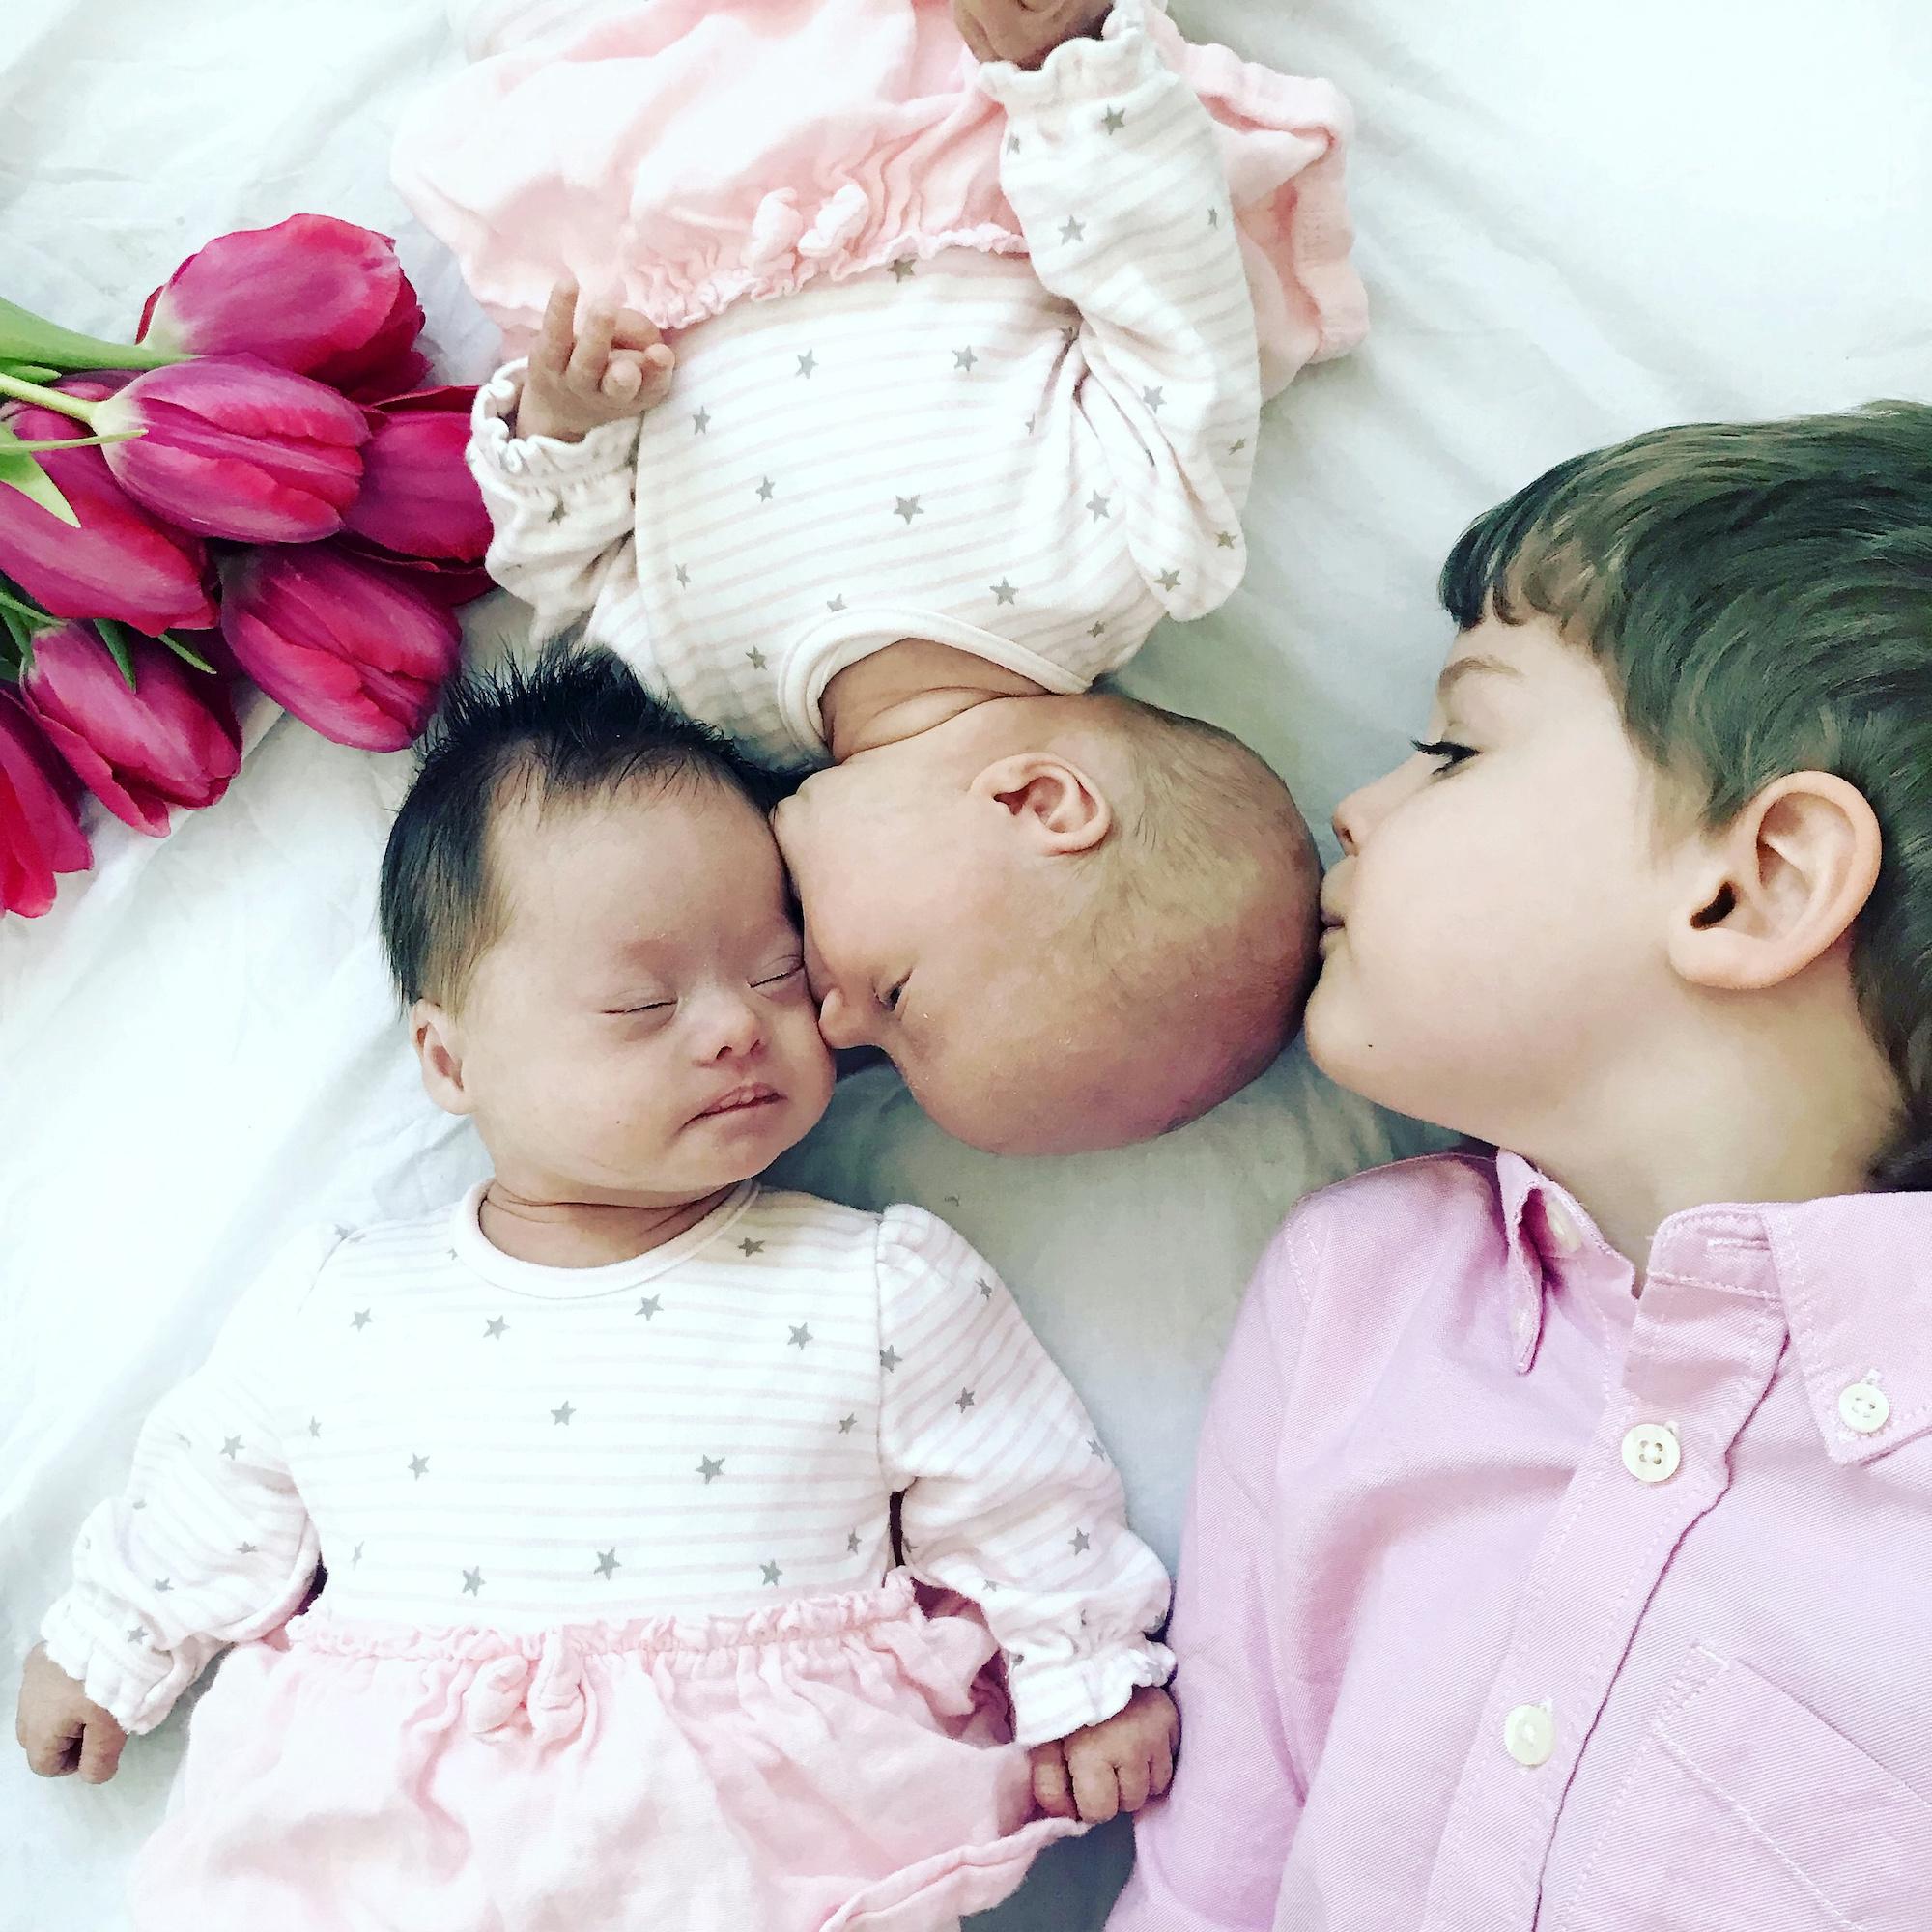 Mια στο εκατομμύριο: Γεννήθηκαν δίδυμα, το ένα με σύνδρομο down και το άλλο χωρίς - Εικόνα 3